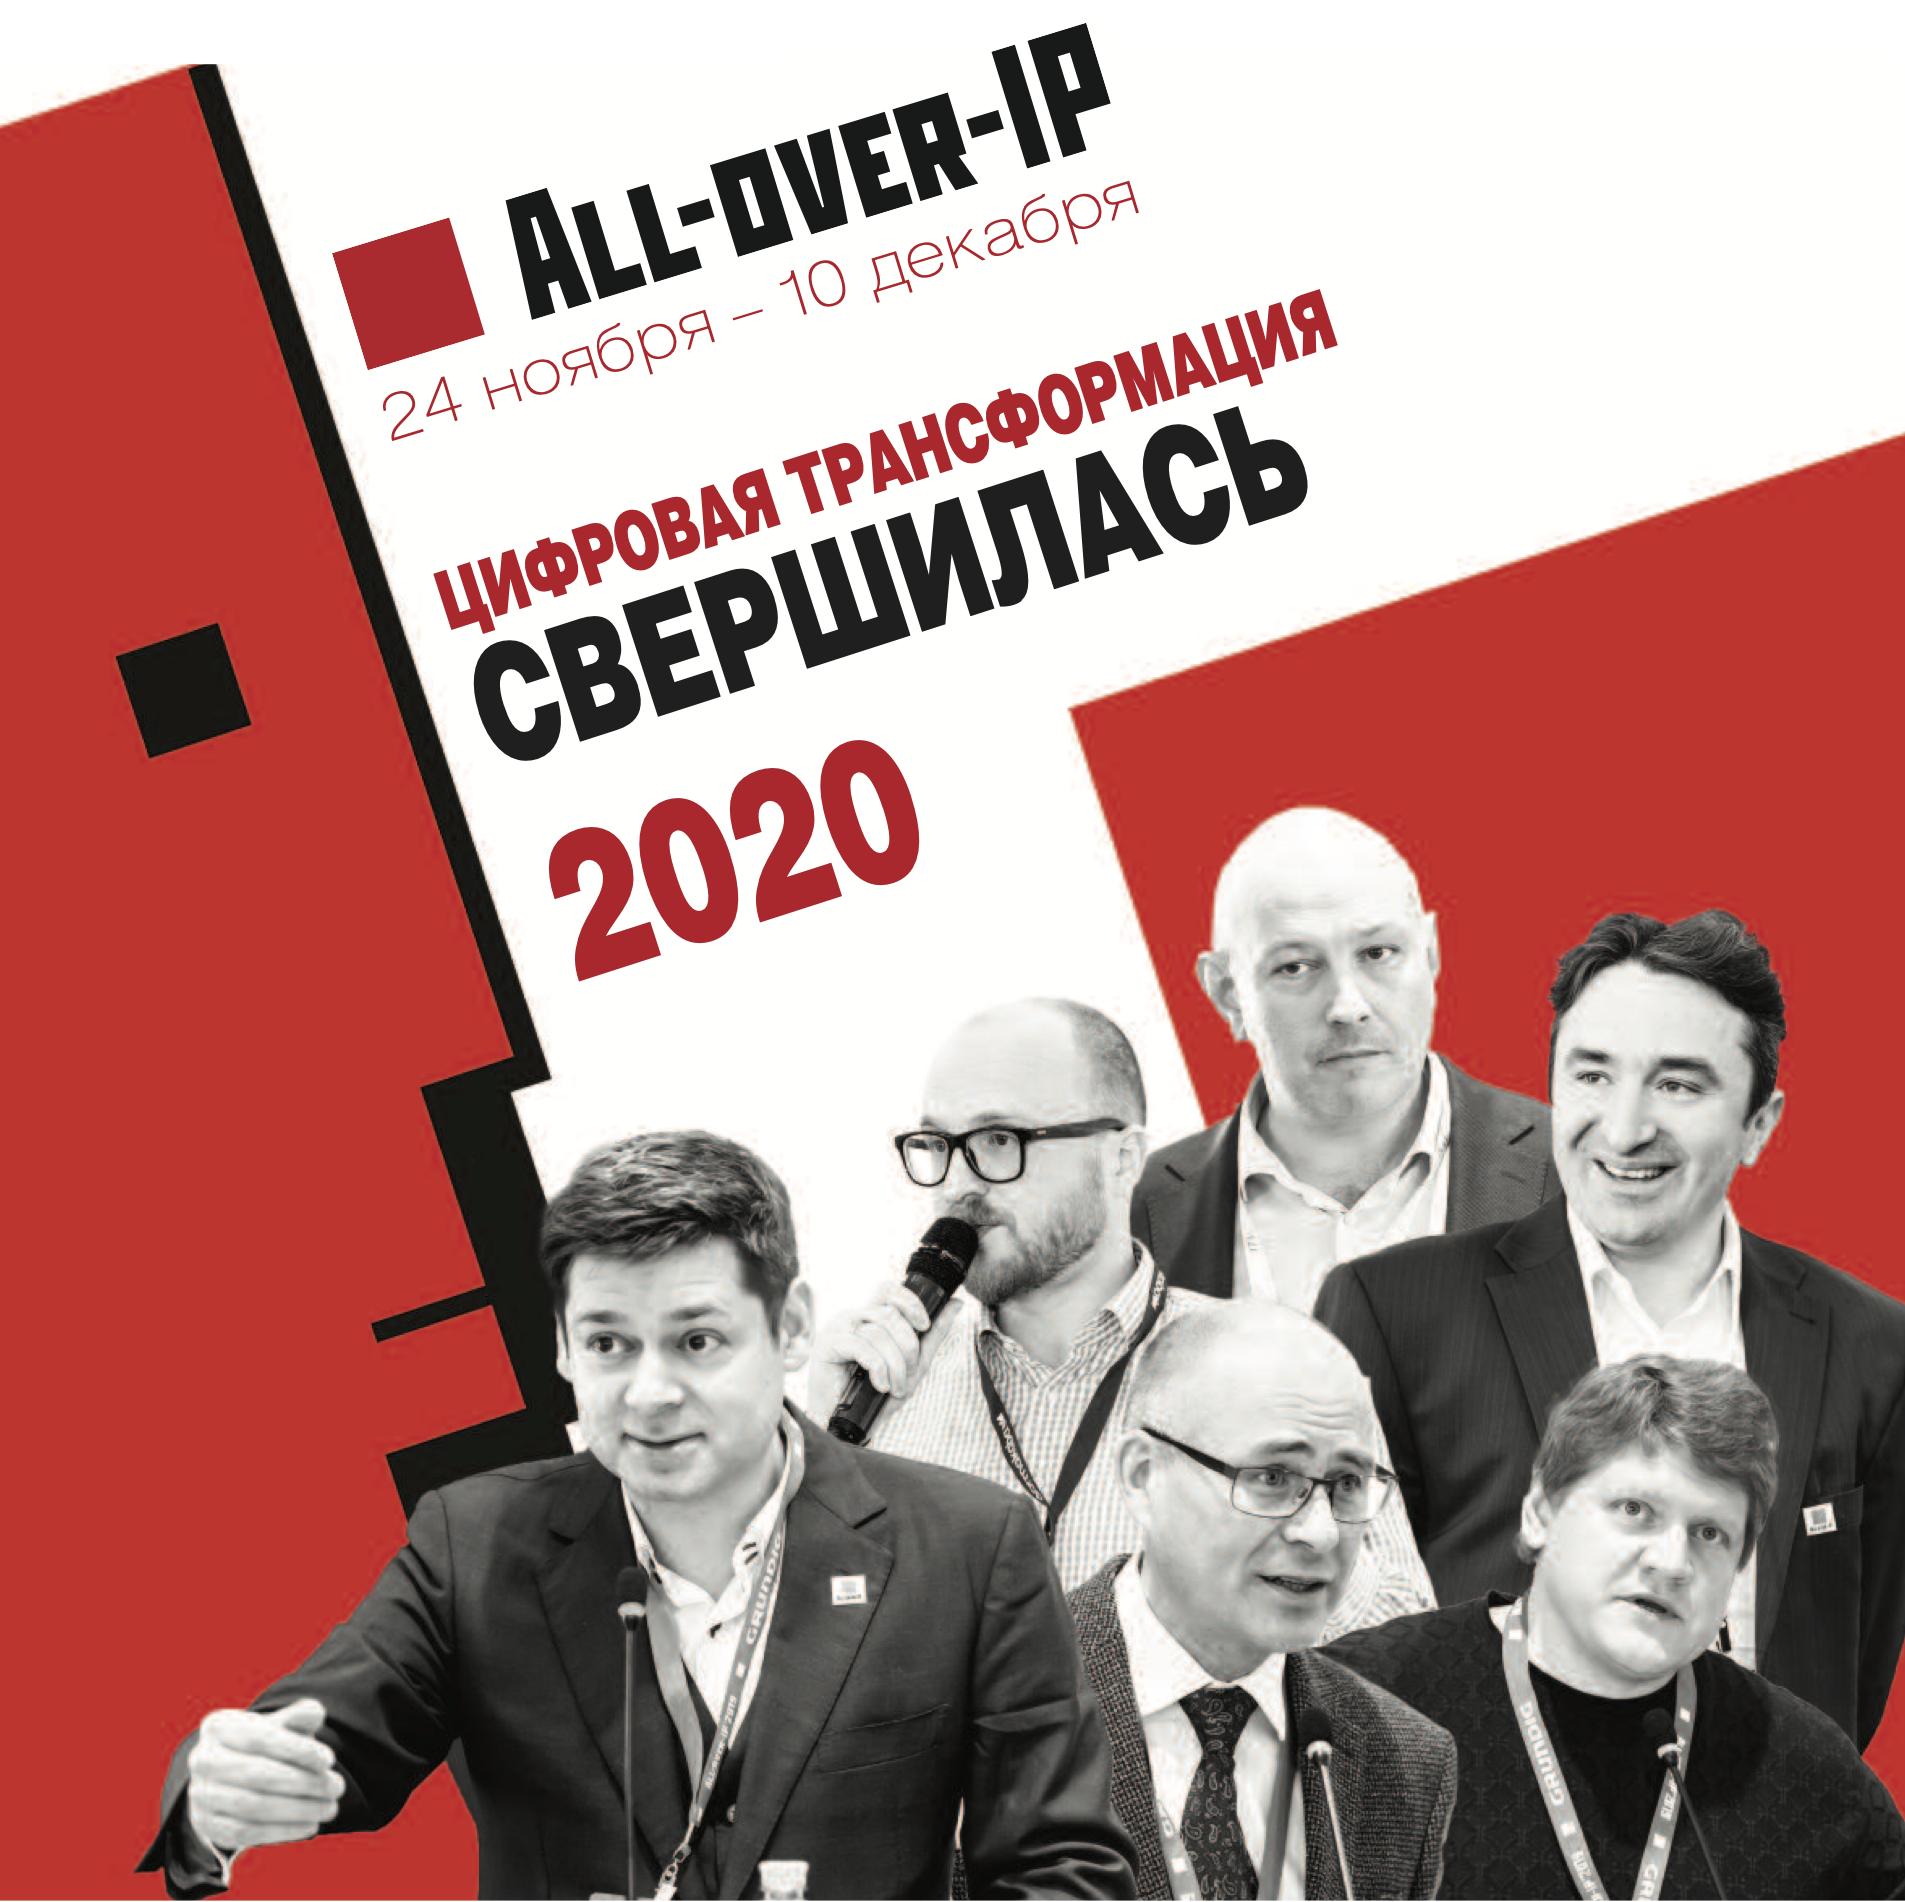 All-over-IP 2020 Online